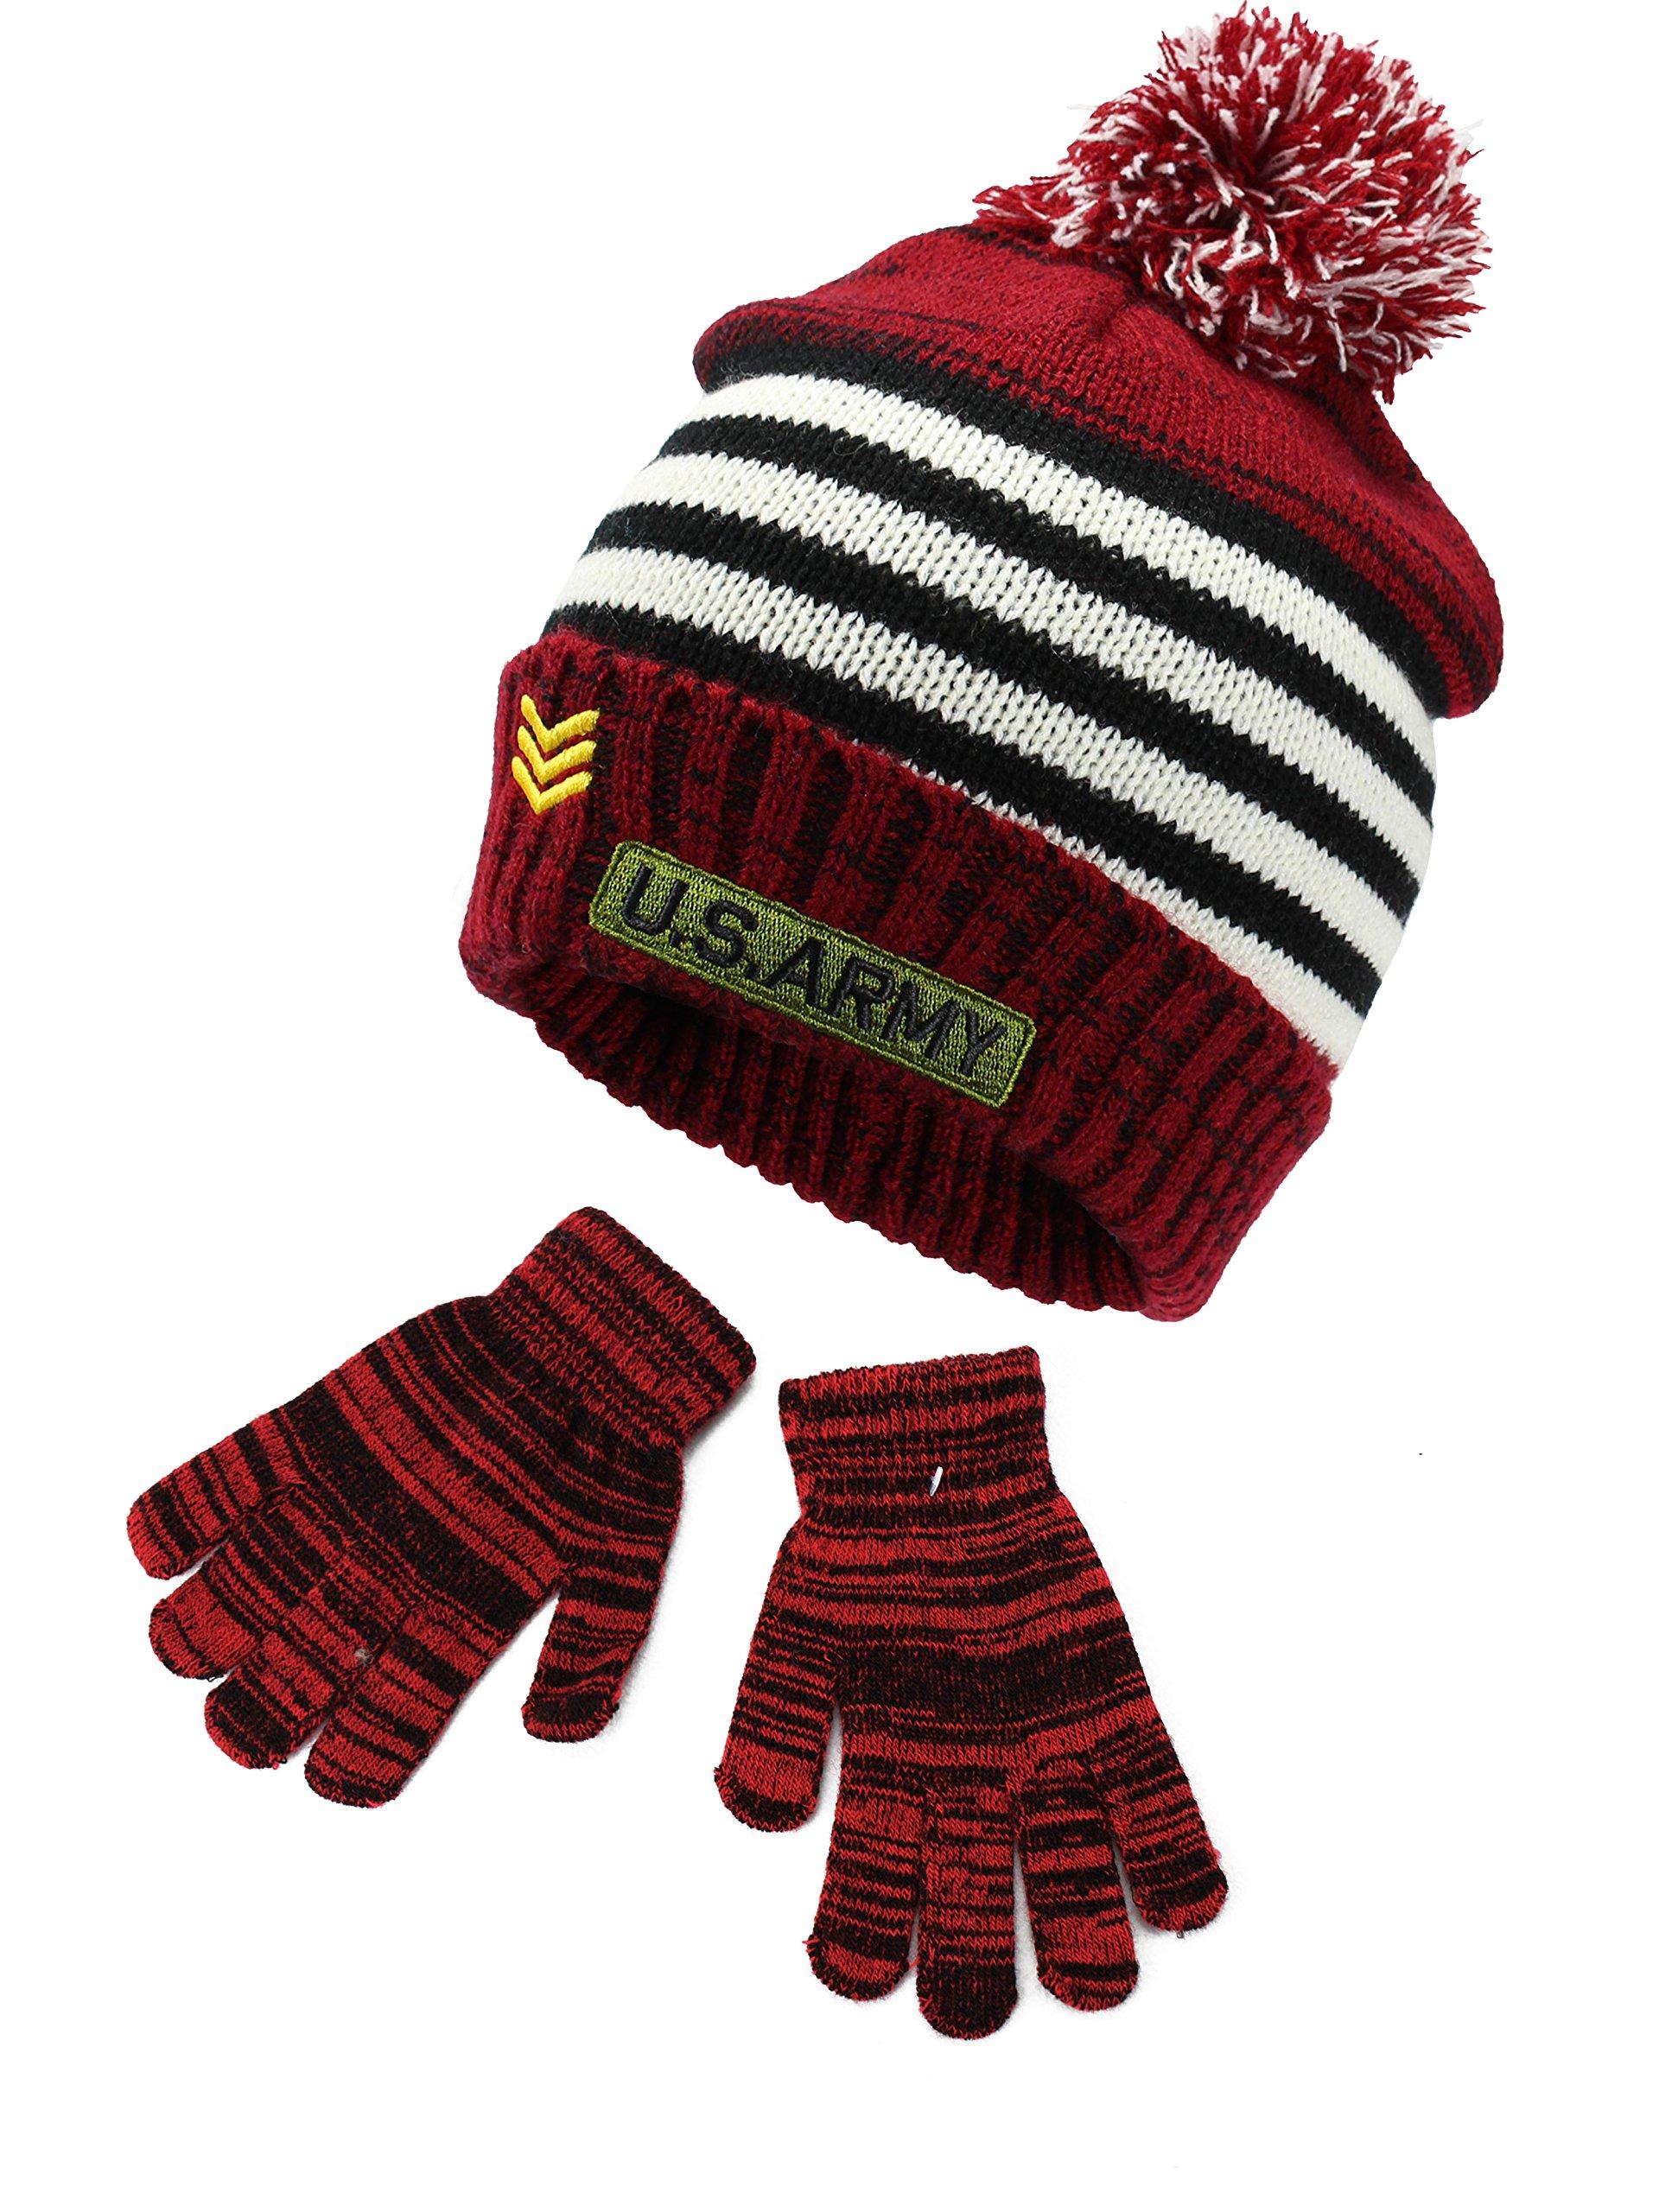 Polar Wear Kids Boys Winter Knit Cuffed Embroidered